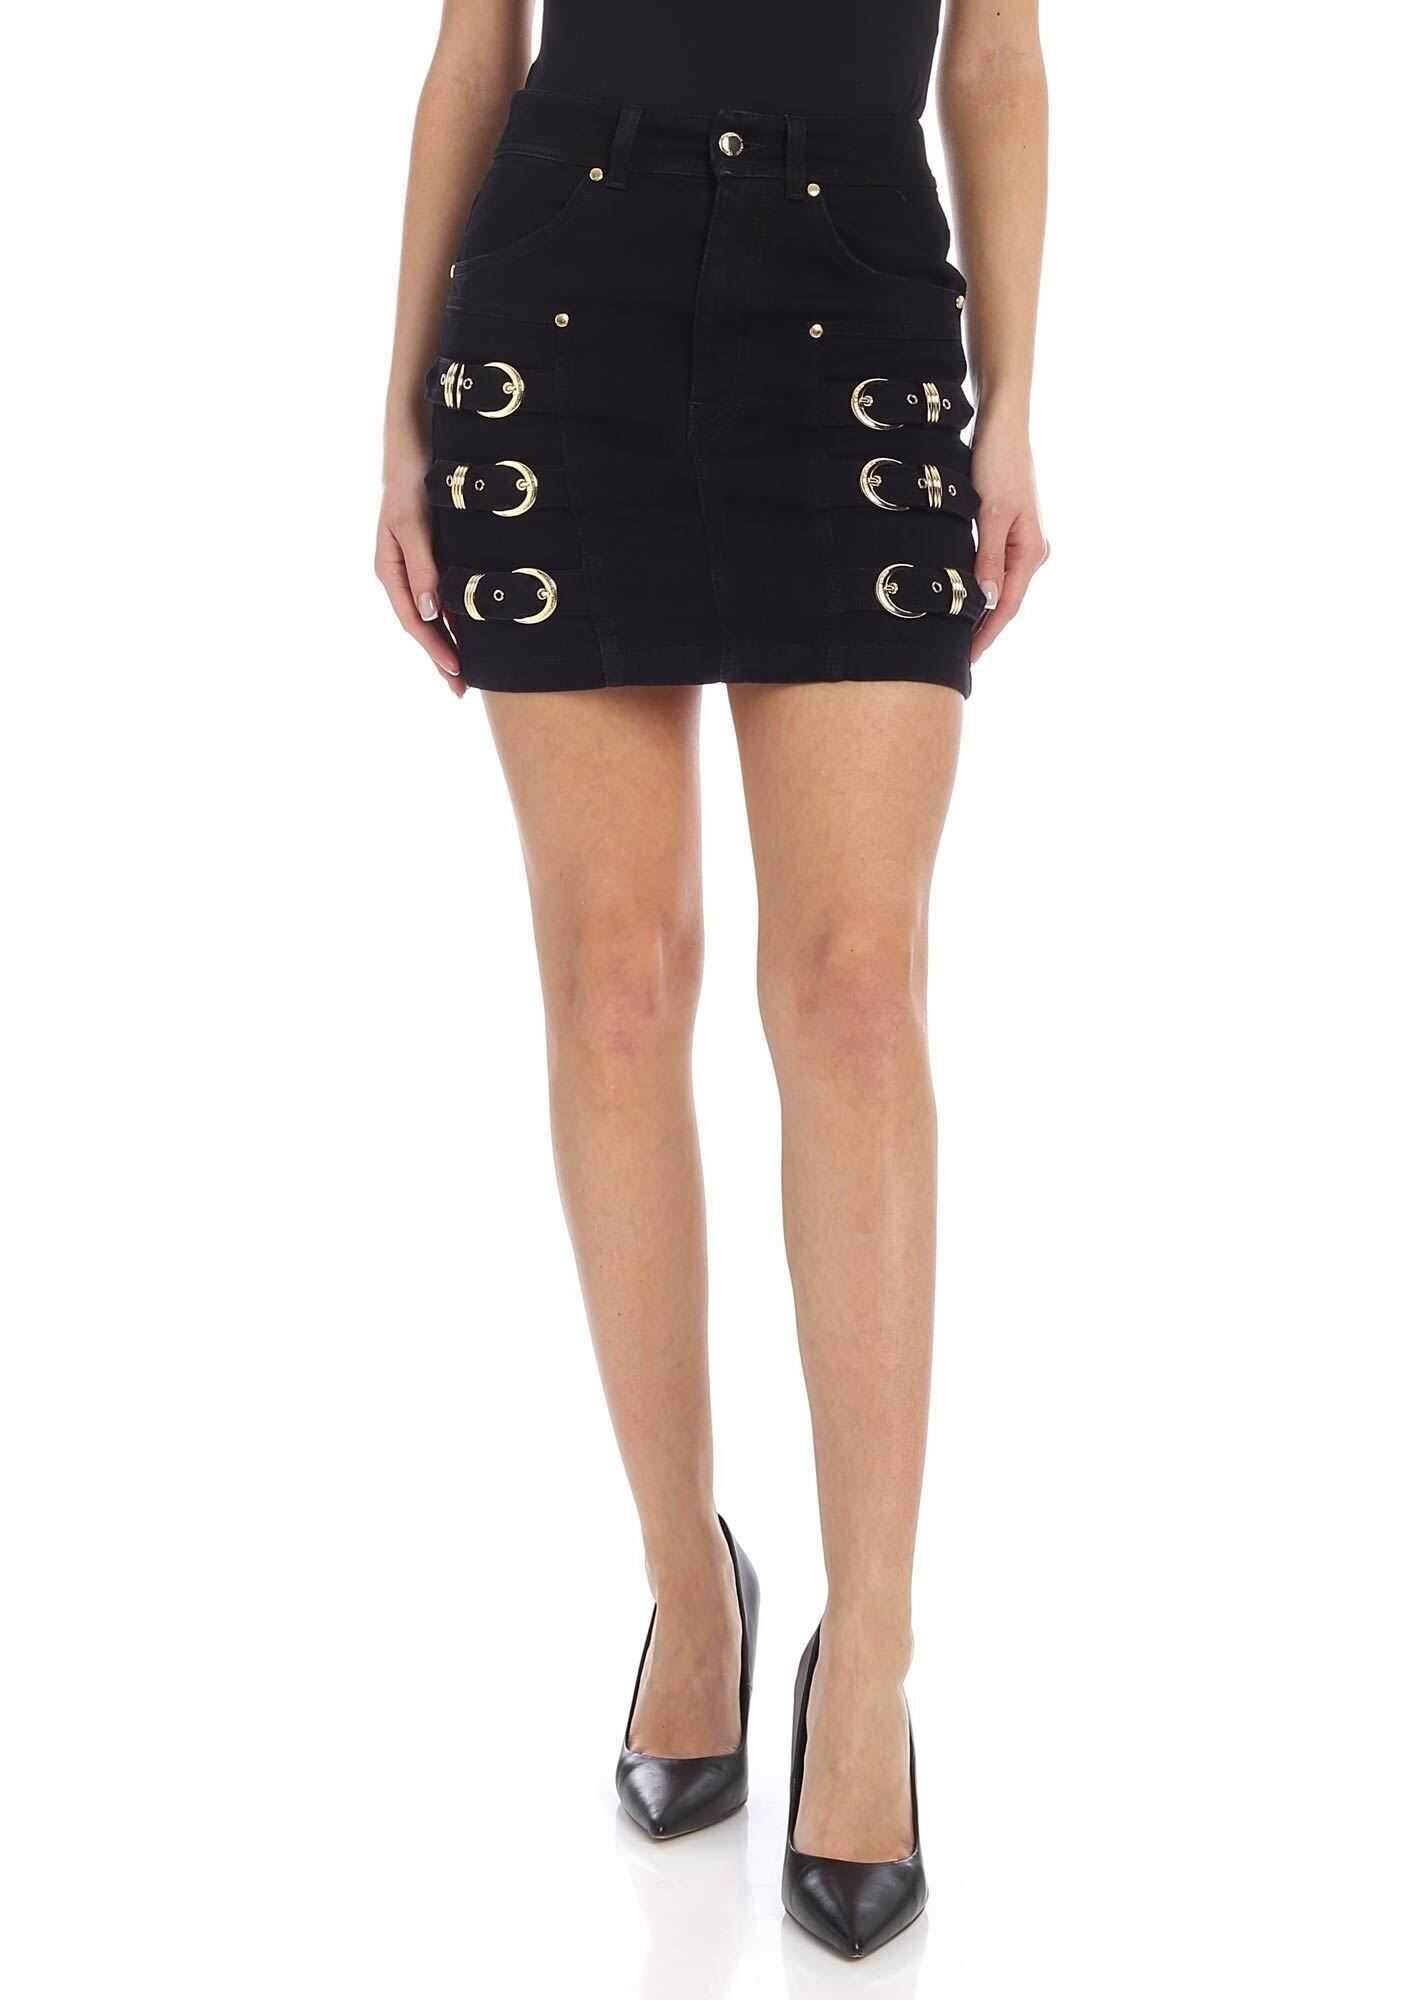 Mini-Skirt In Black With Golden Details thumbnail